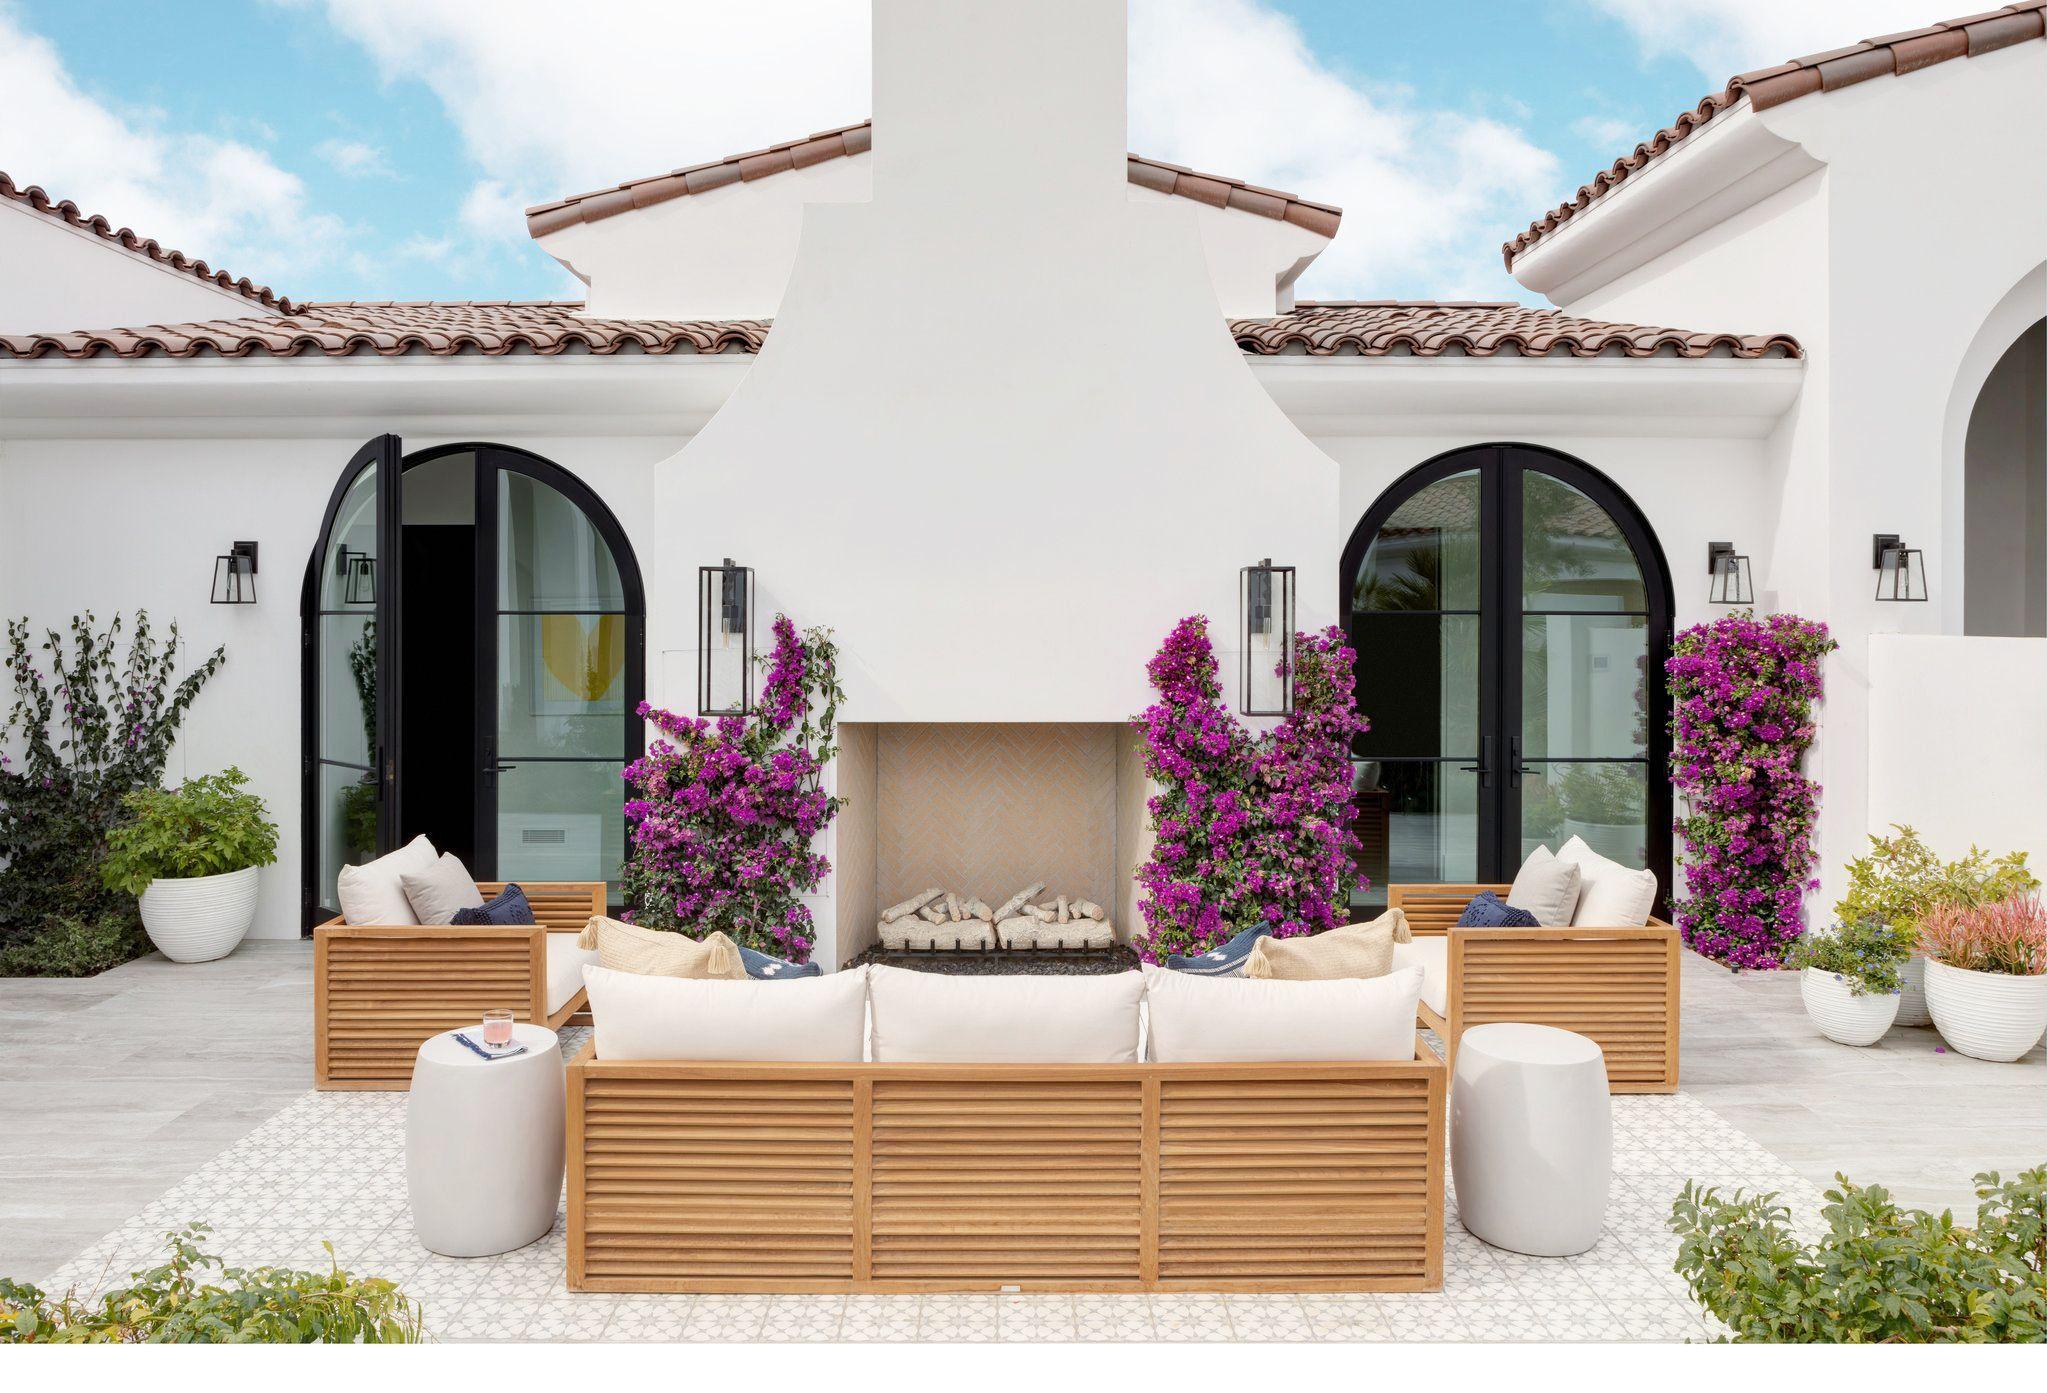 40 best patio ideas for 2019 stylish outdoor patio design ideas rh housebeautiful com